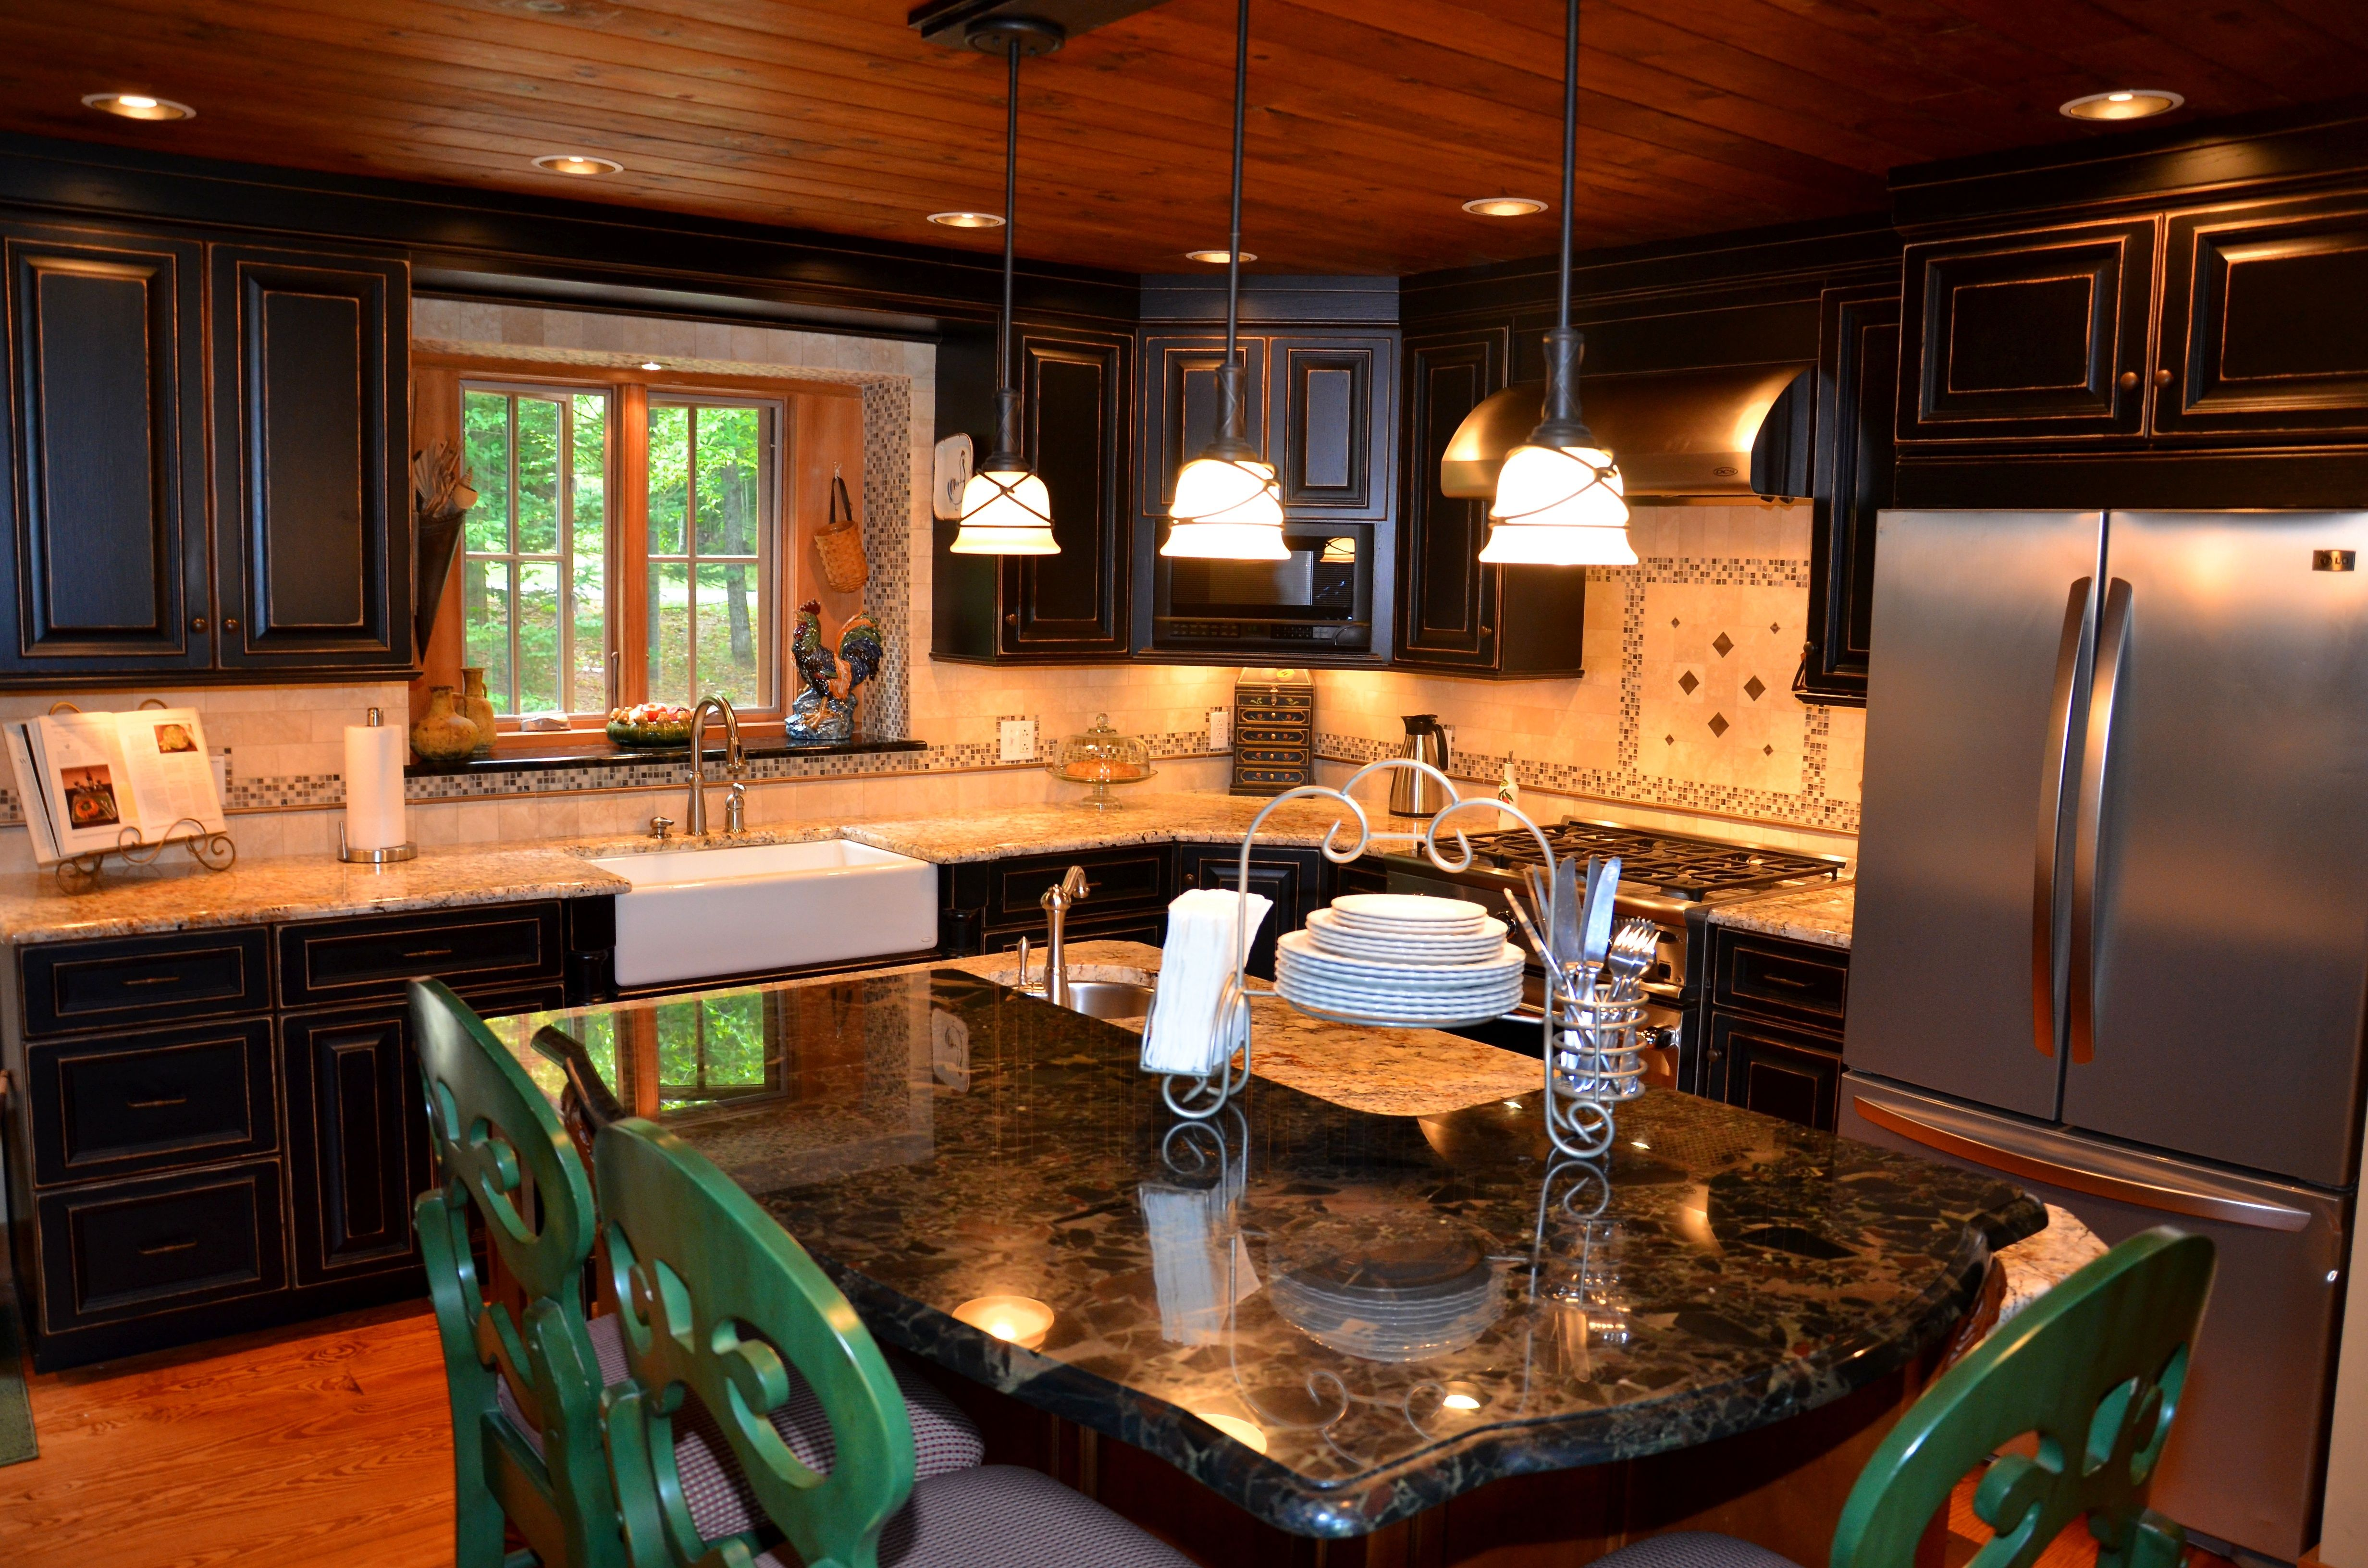 Gold U0026 Silver Granite Countertop With Black Cabinets. Black Beauty Granite  Island. Kitchen By